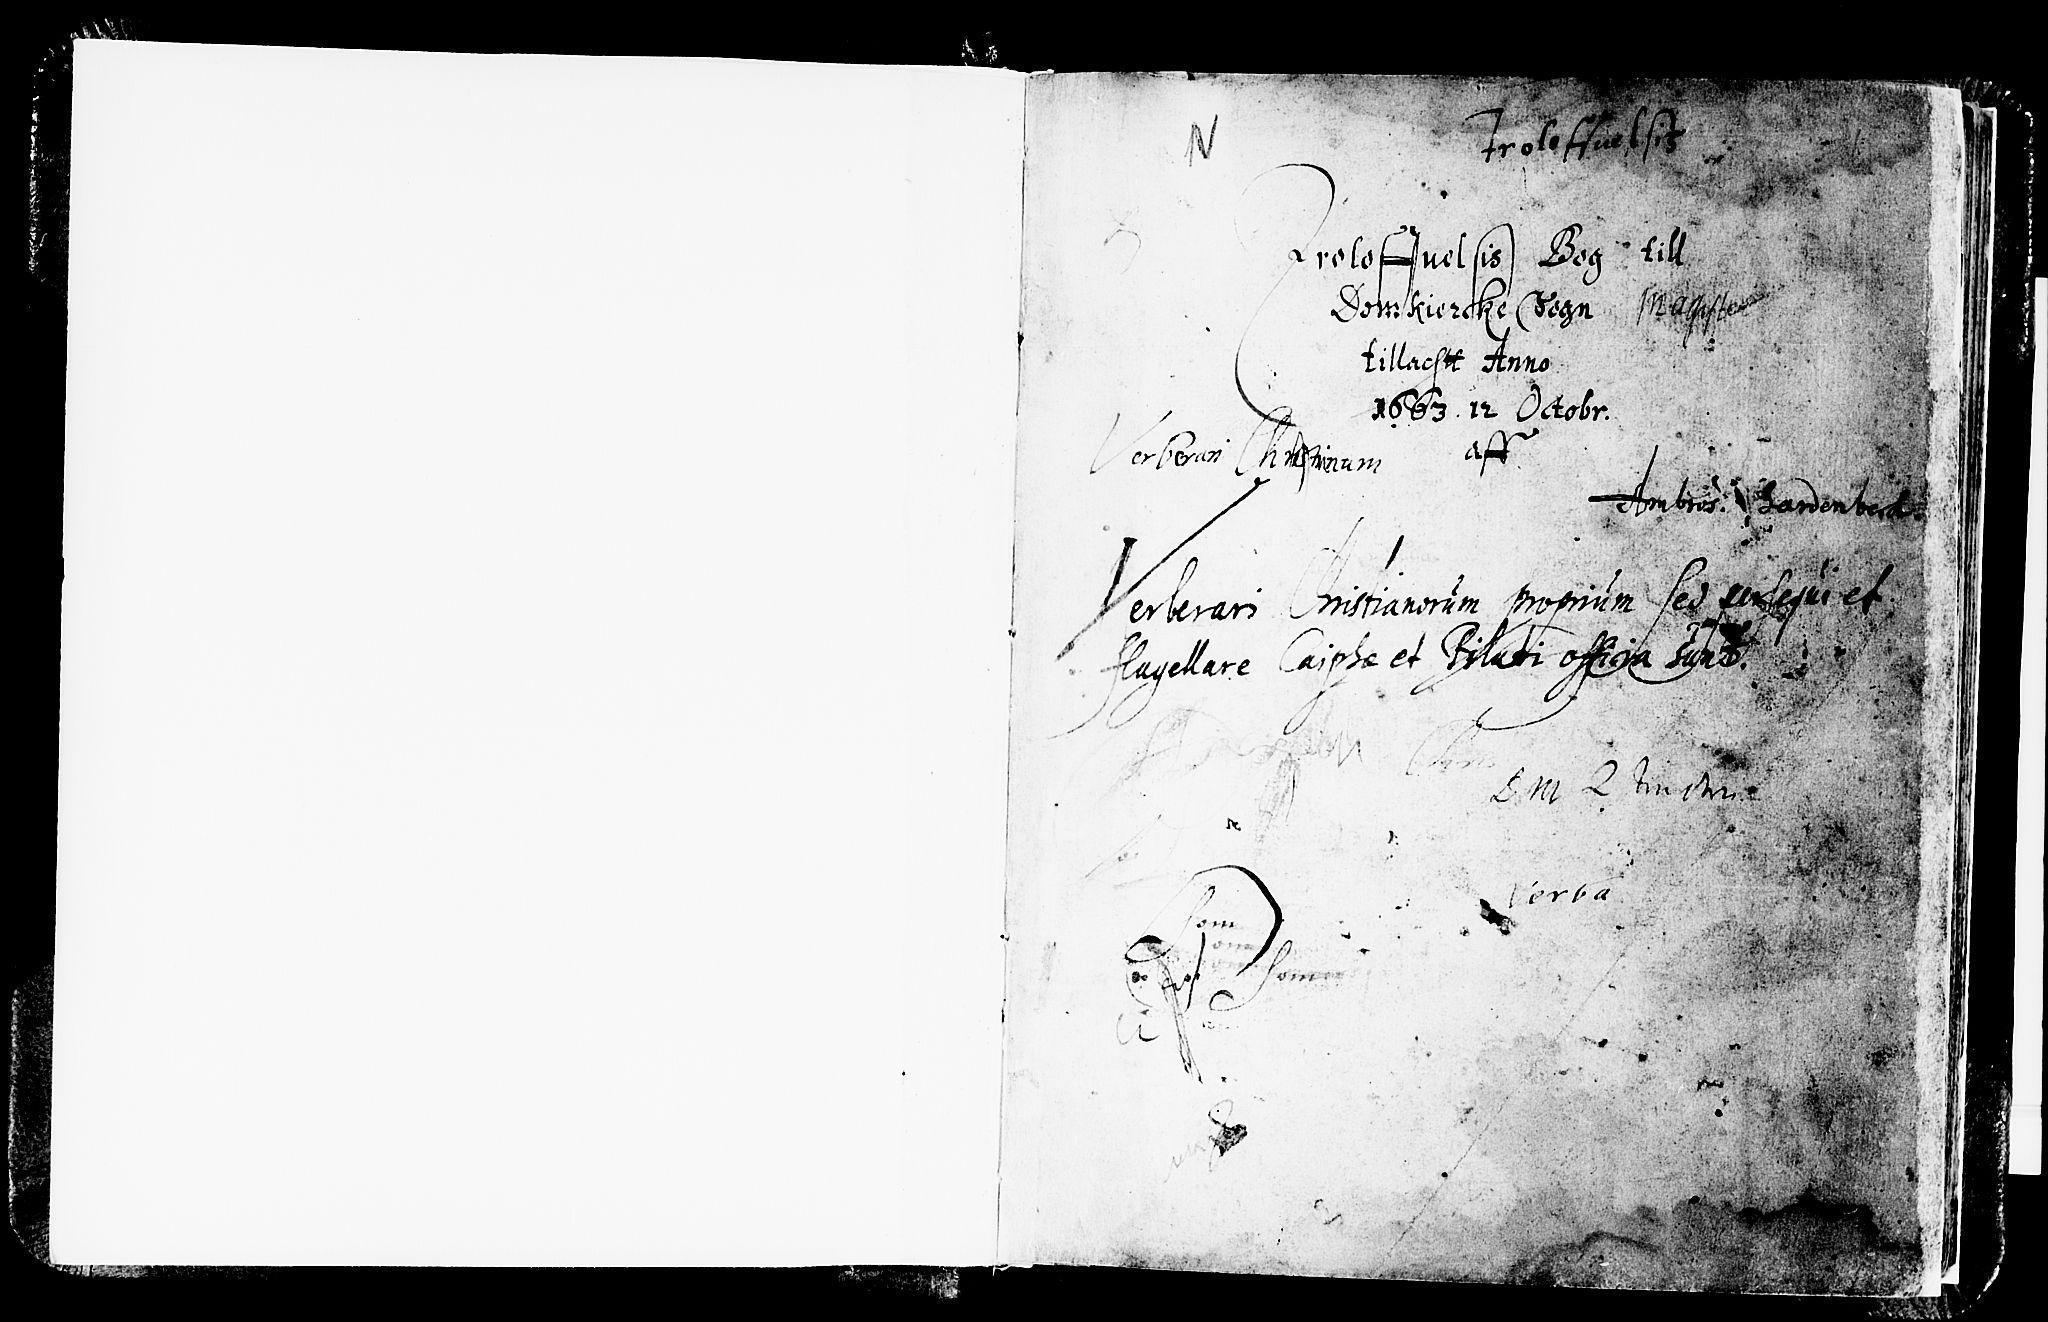 SAB, Domkirken Sokneprestembete, H/Haa/L0006: Ministerialbok nr. A 6, 1663-1683, s. 1